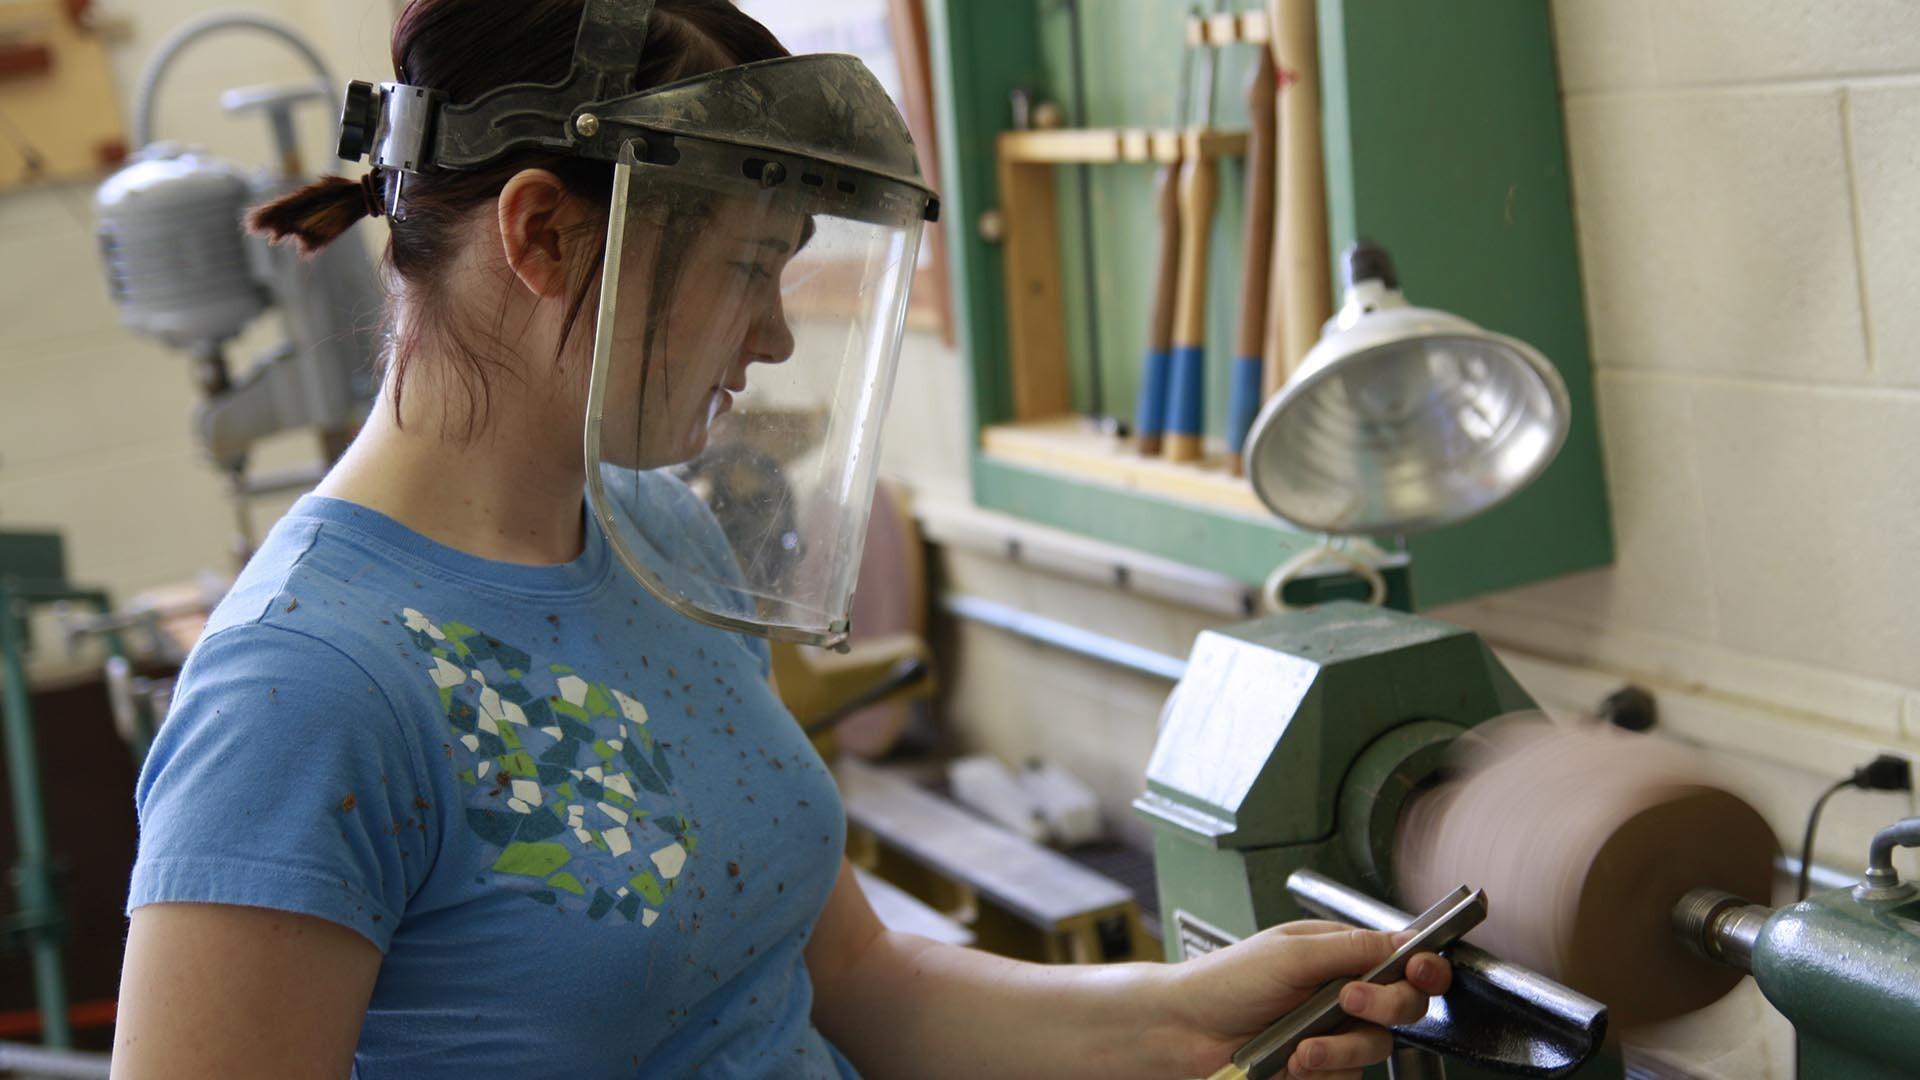 A female student using a wood working machine